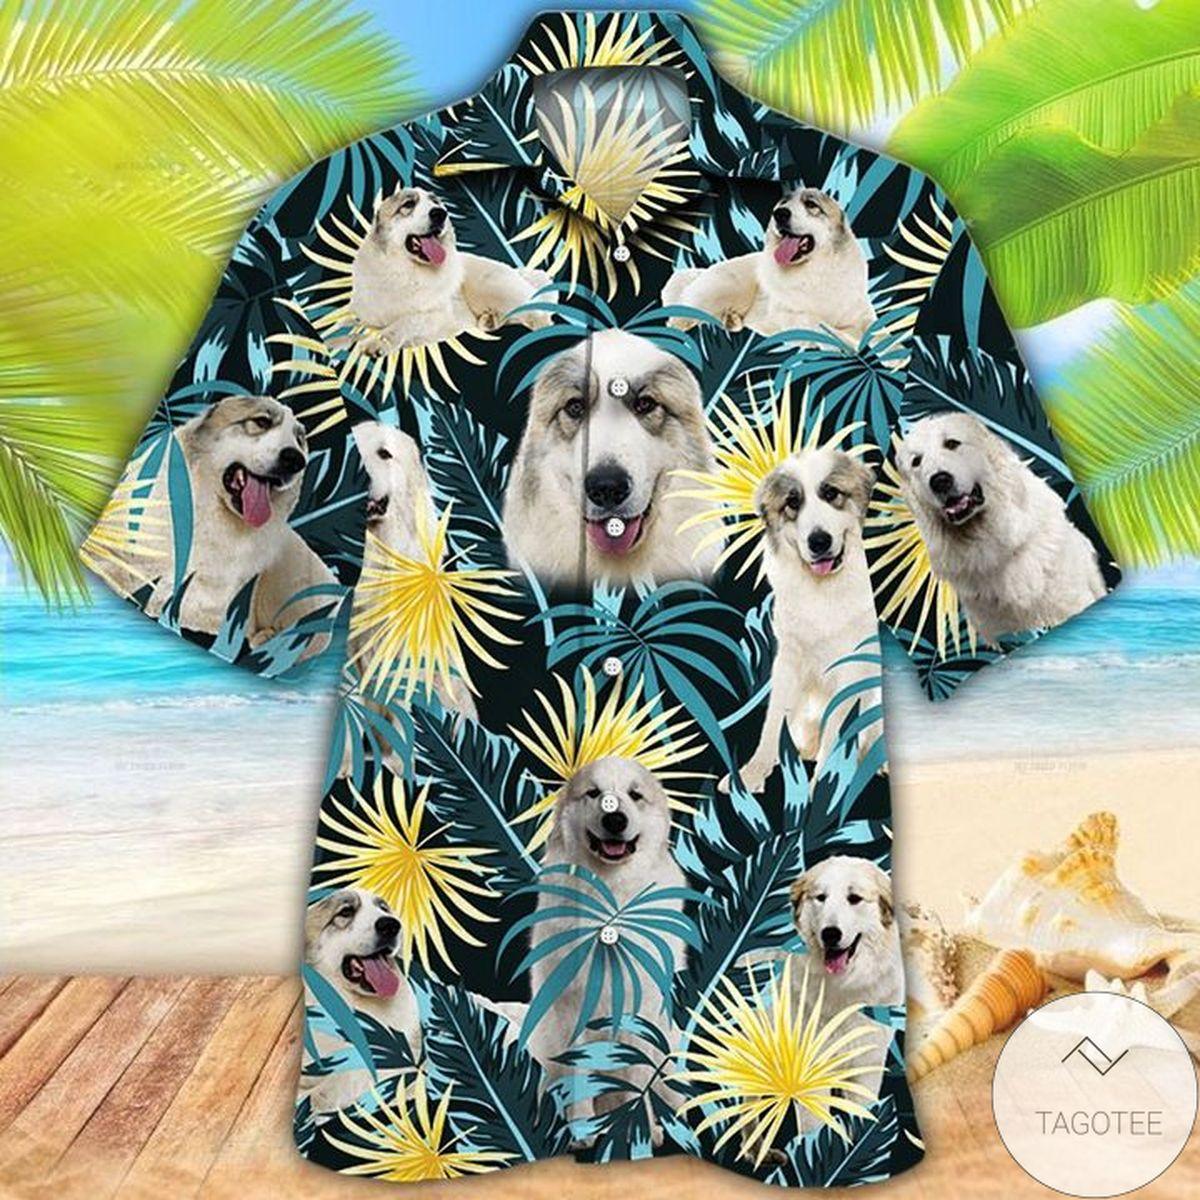 Great Pyrenees Dog Lovers Blue And Yellow Plants Hawaiian Shirt